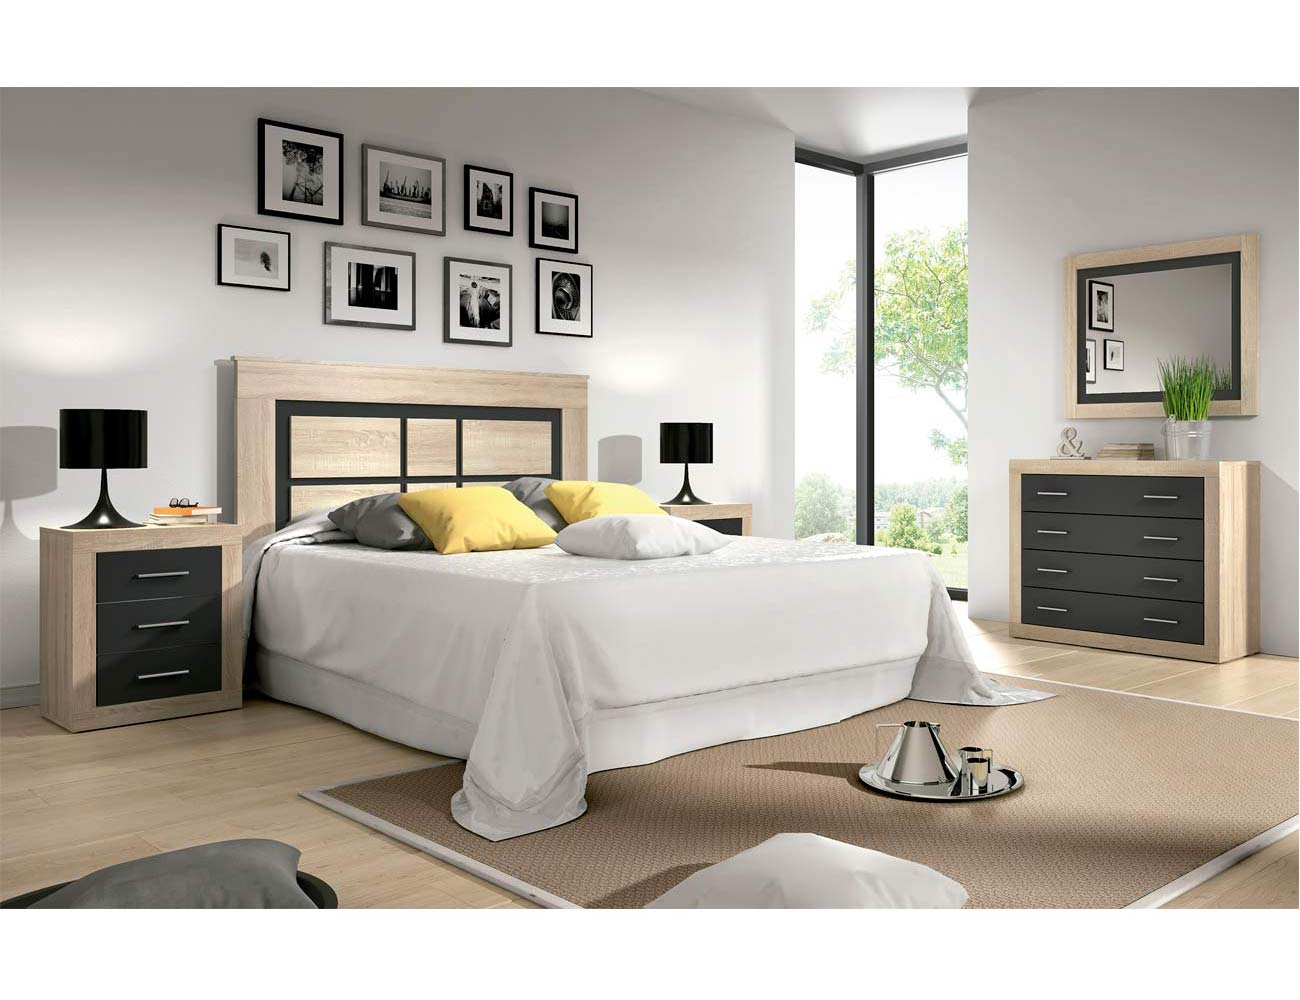 01 dormitorio matrimonio comoda cambrian grafito